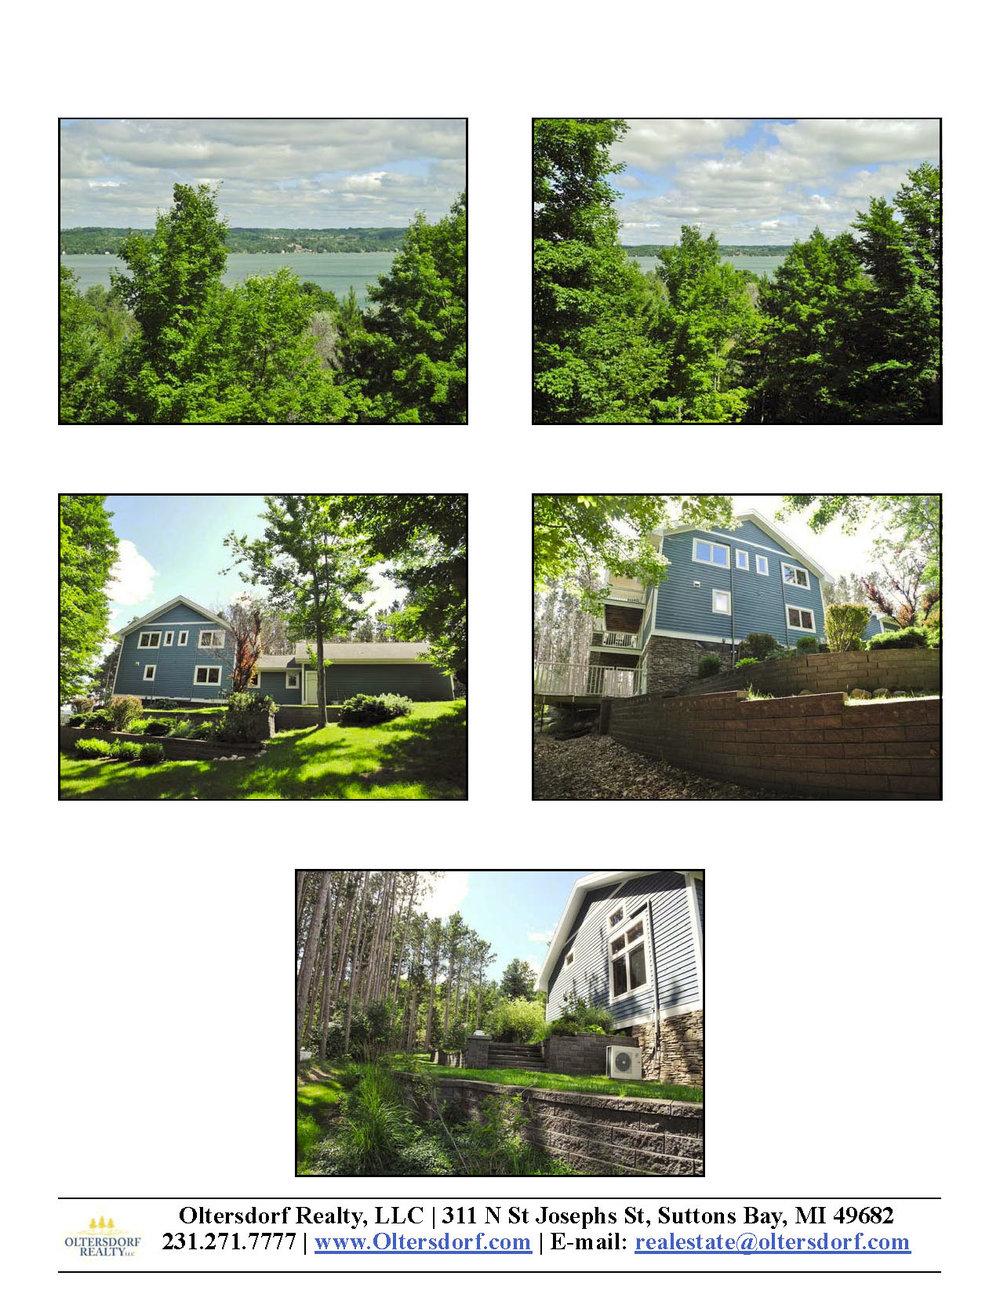 5500 E Hidden Beech, Cedar, MI - For sale by Oltersdorf Realty LLC - Marketing Packet (3).jpg